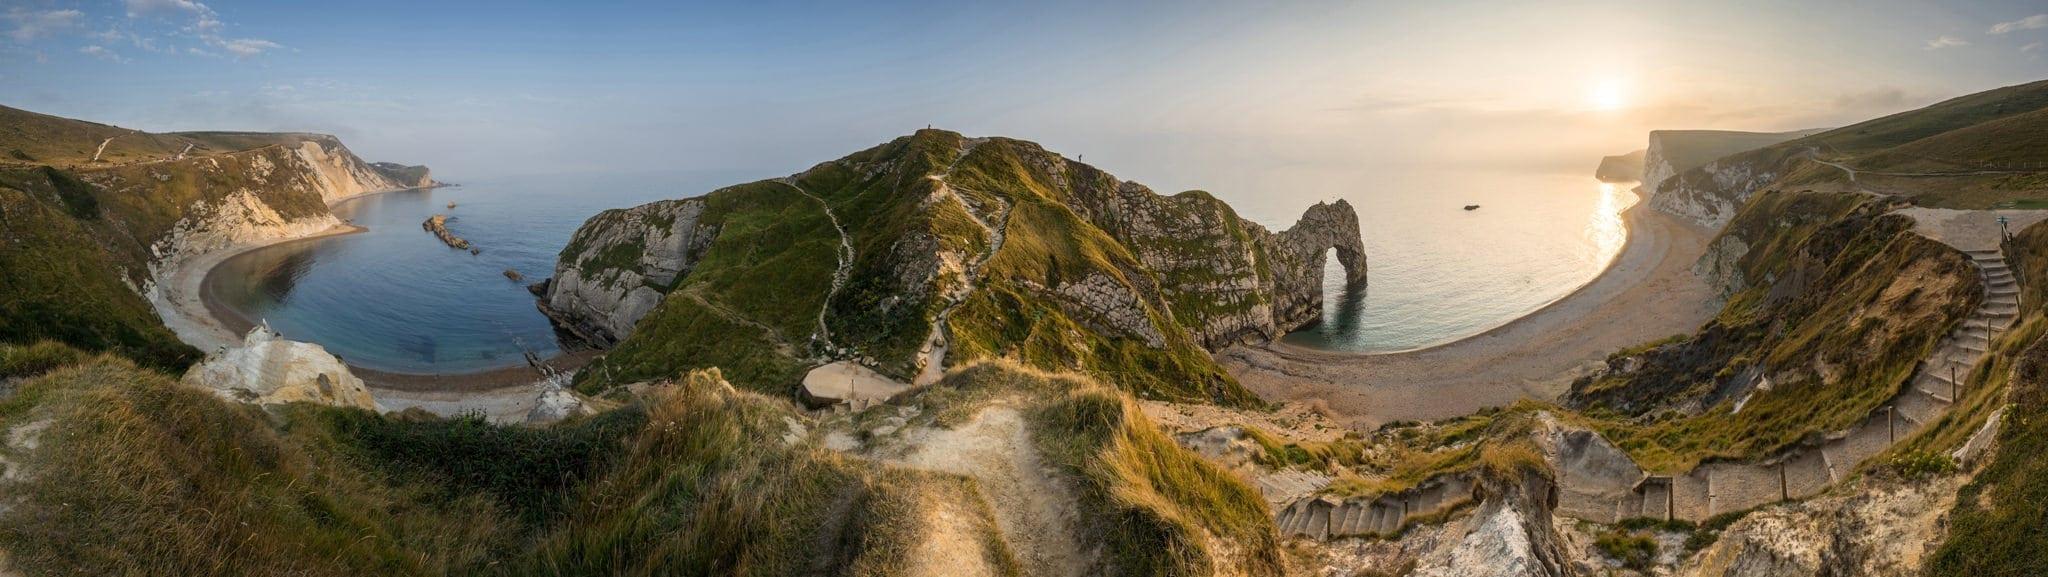 Durdle Door Panoramic - Dorset Photography